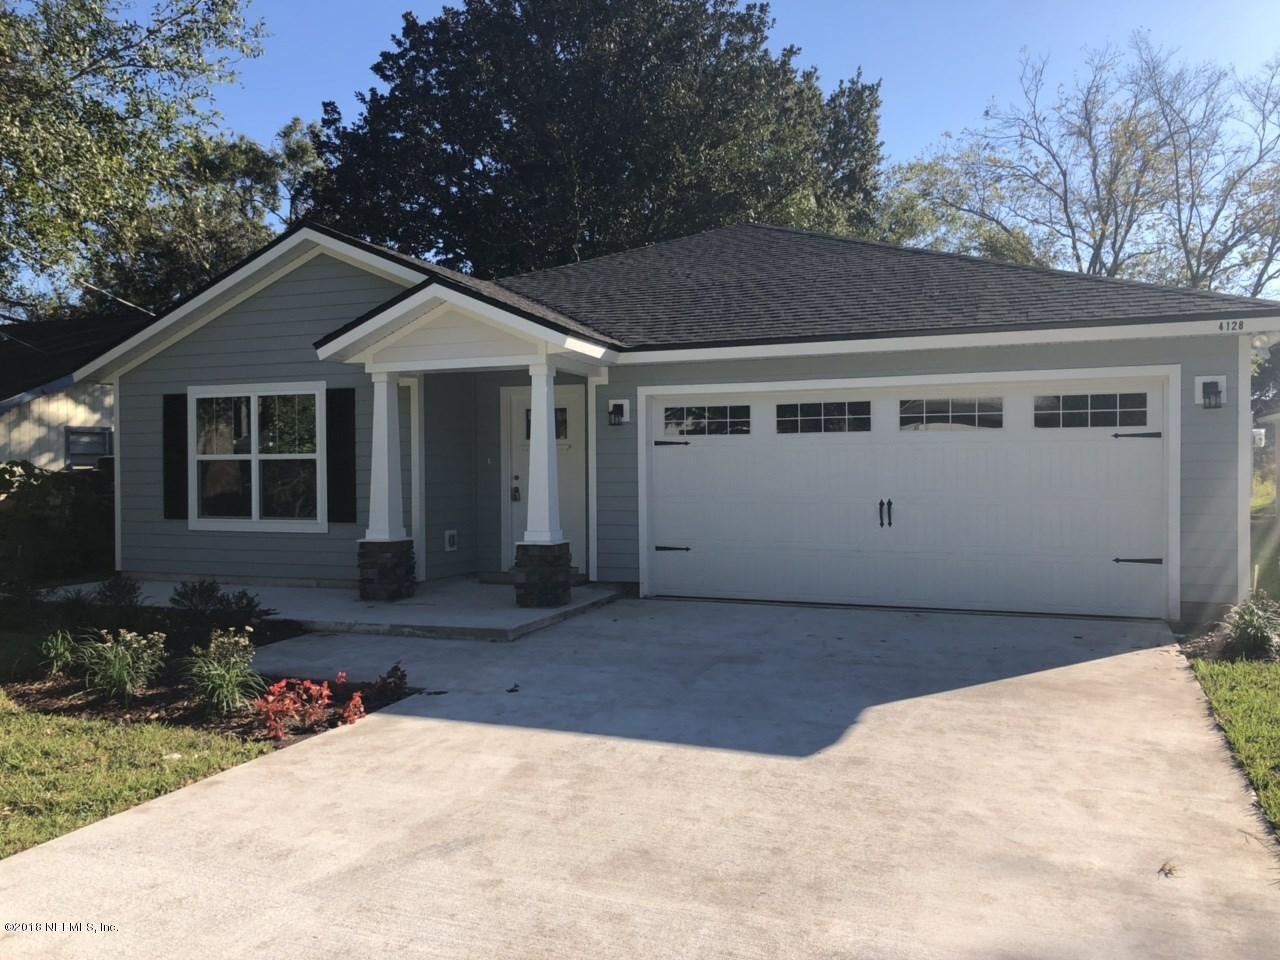 4128 ADIROLF, JACKSONVILLE, FLORIDA 32207, 3 Bedrooms Bedrooms, ,2 BathroomsBathrooms,Residential - single family,For sale,ADIROLF,967530